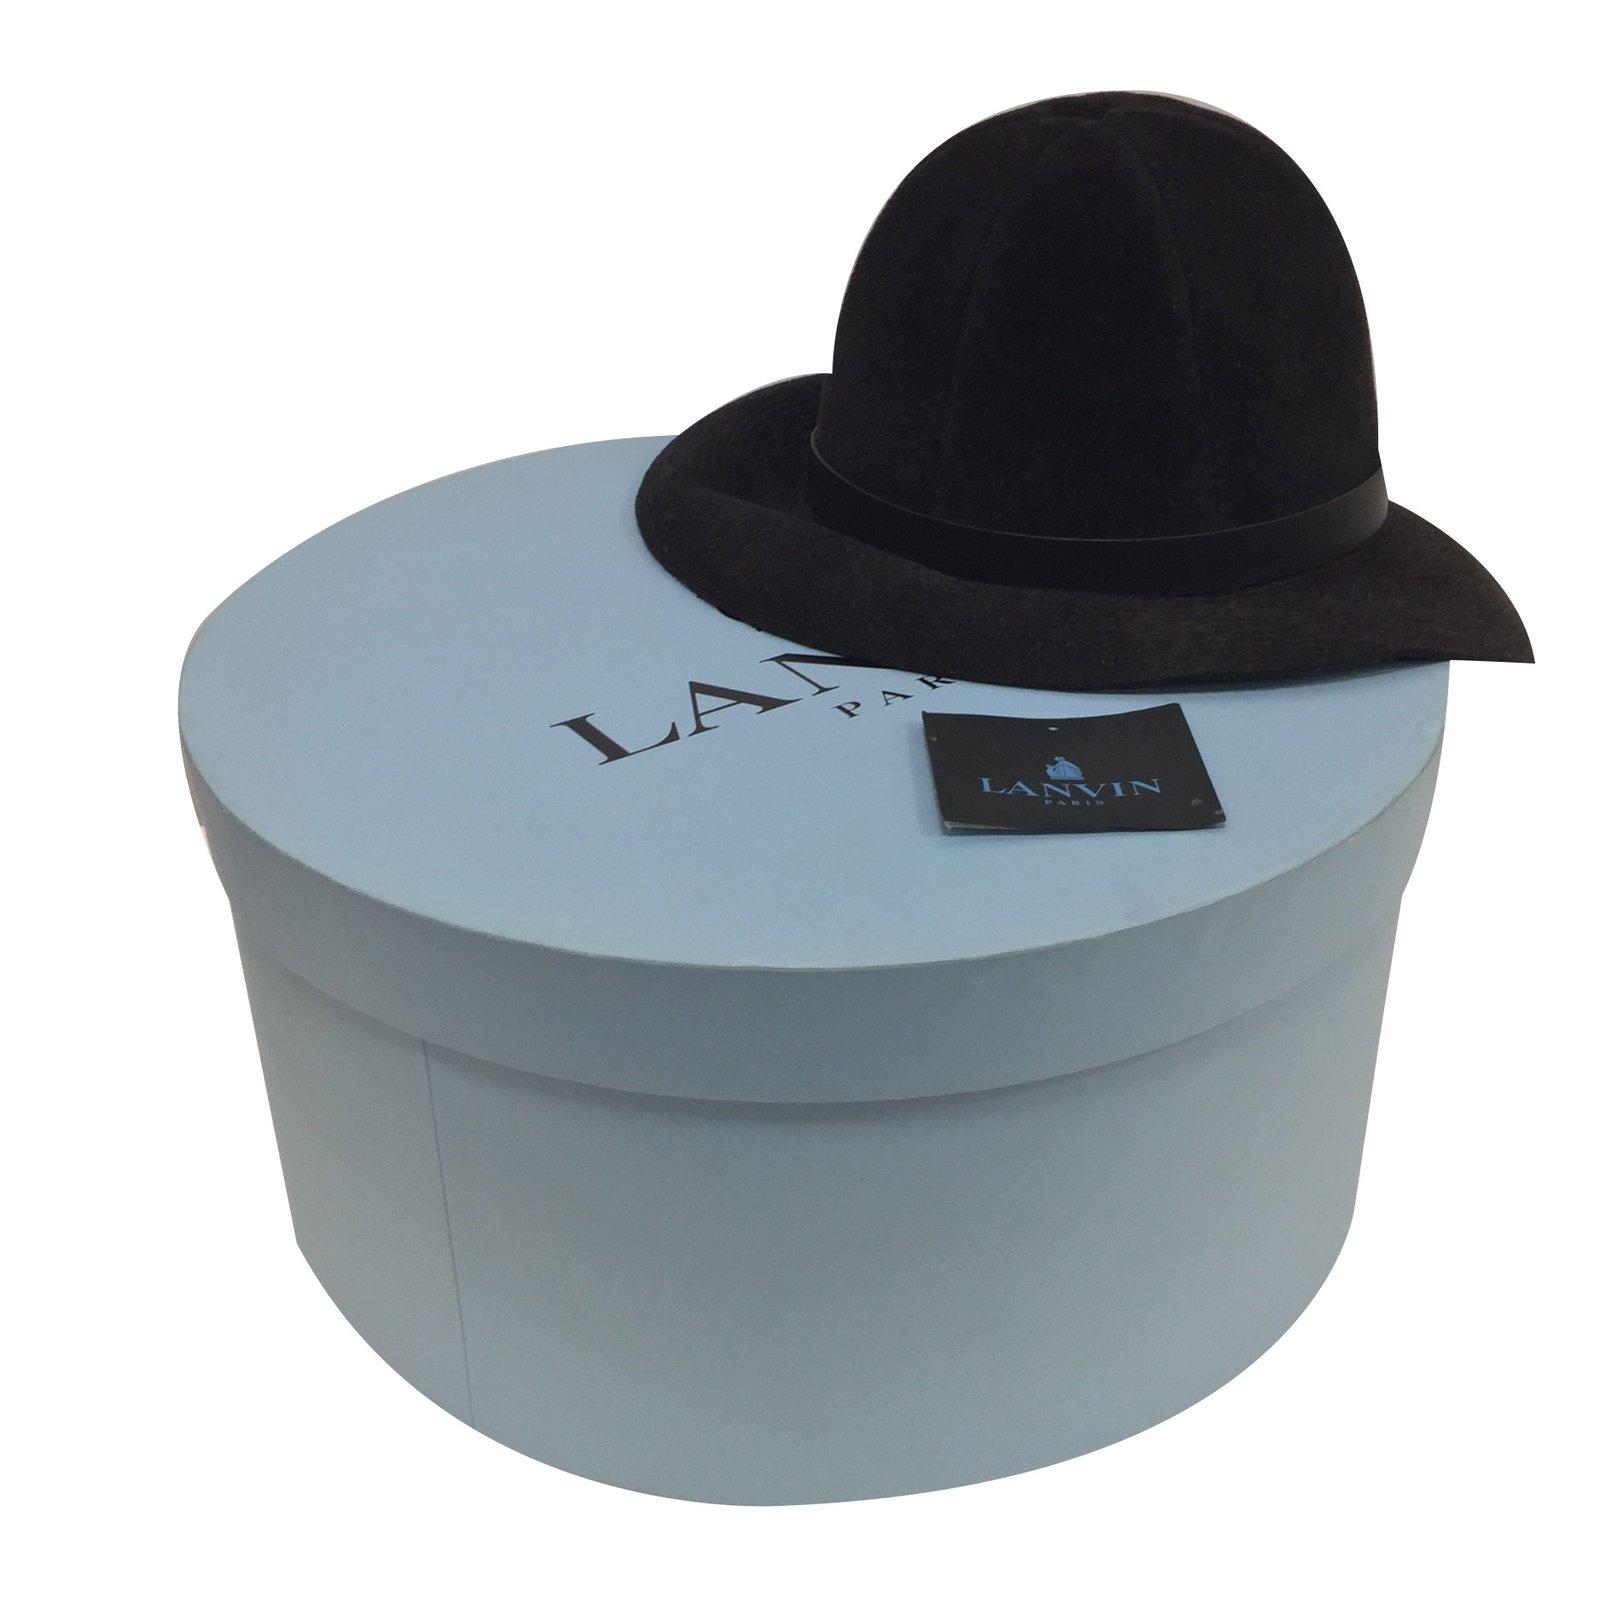 Lanvin Hat Hats Fur Black ref.47055